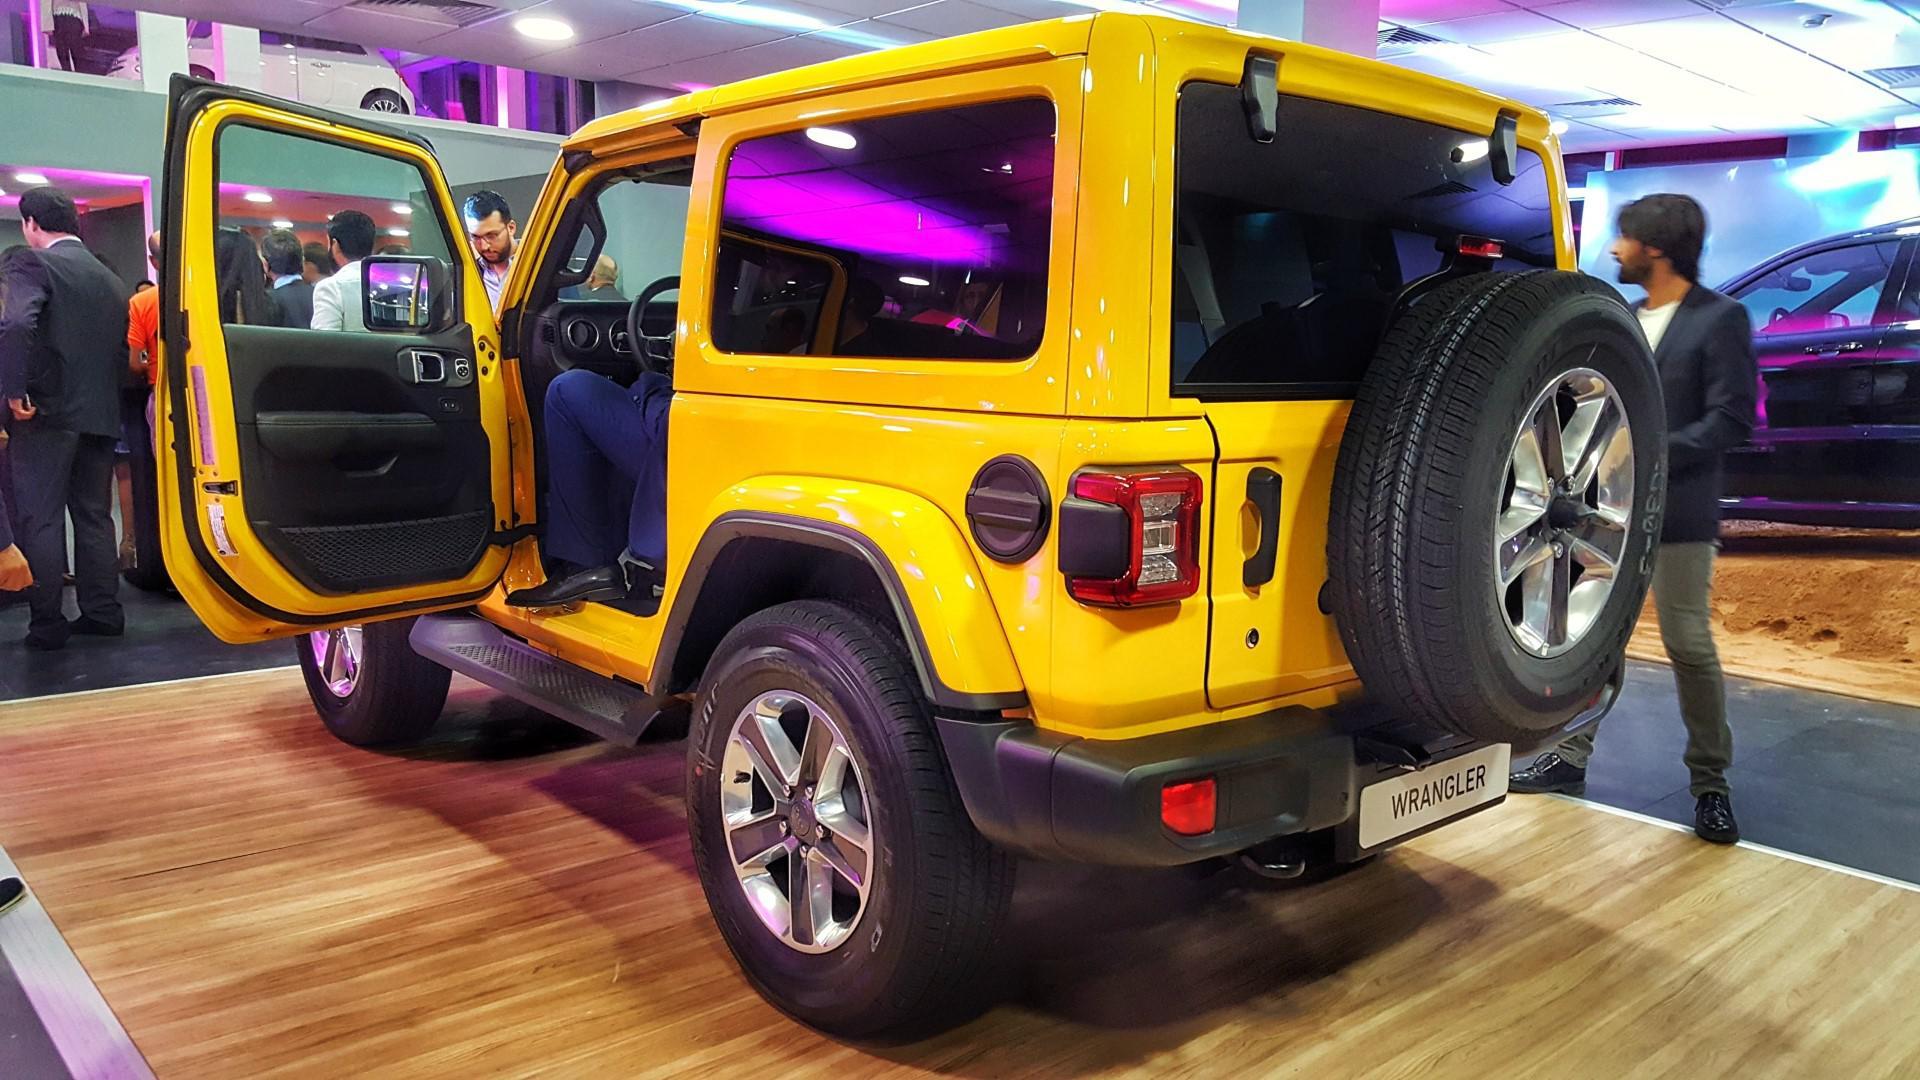 orbis-automotive-inaugure-son-nouveau-showroom-a-rabat-1119-10.jpg